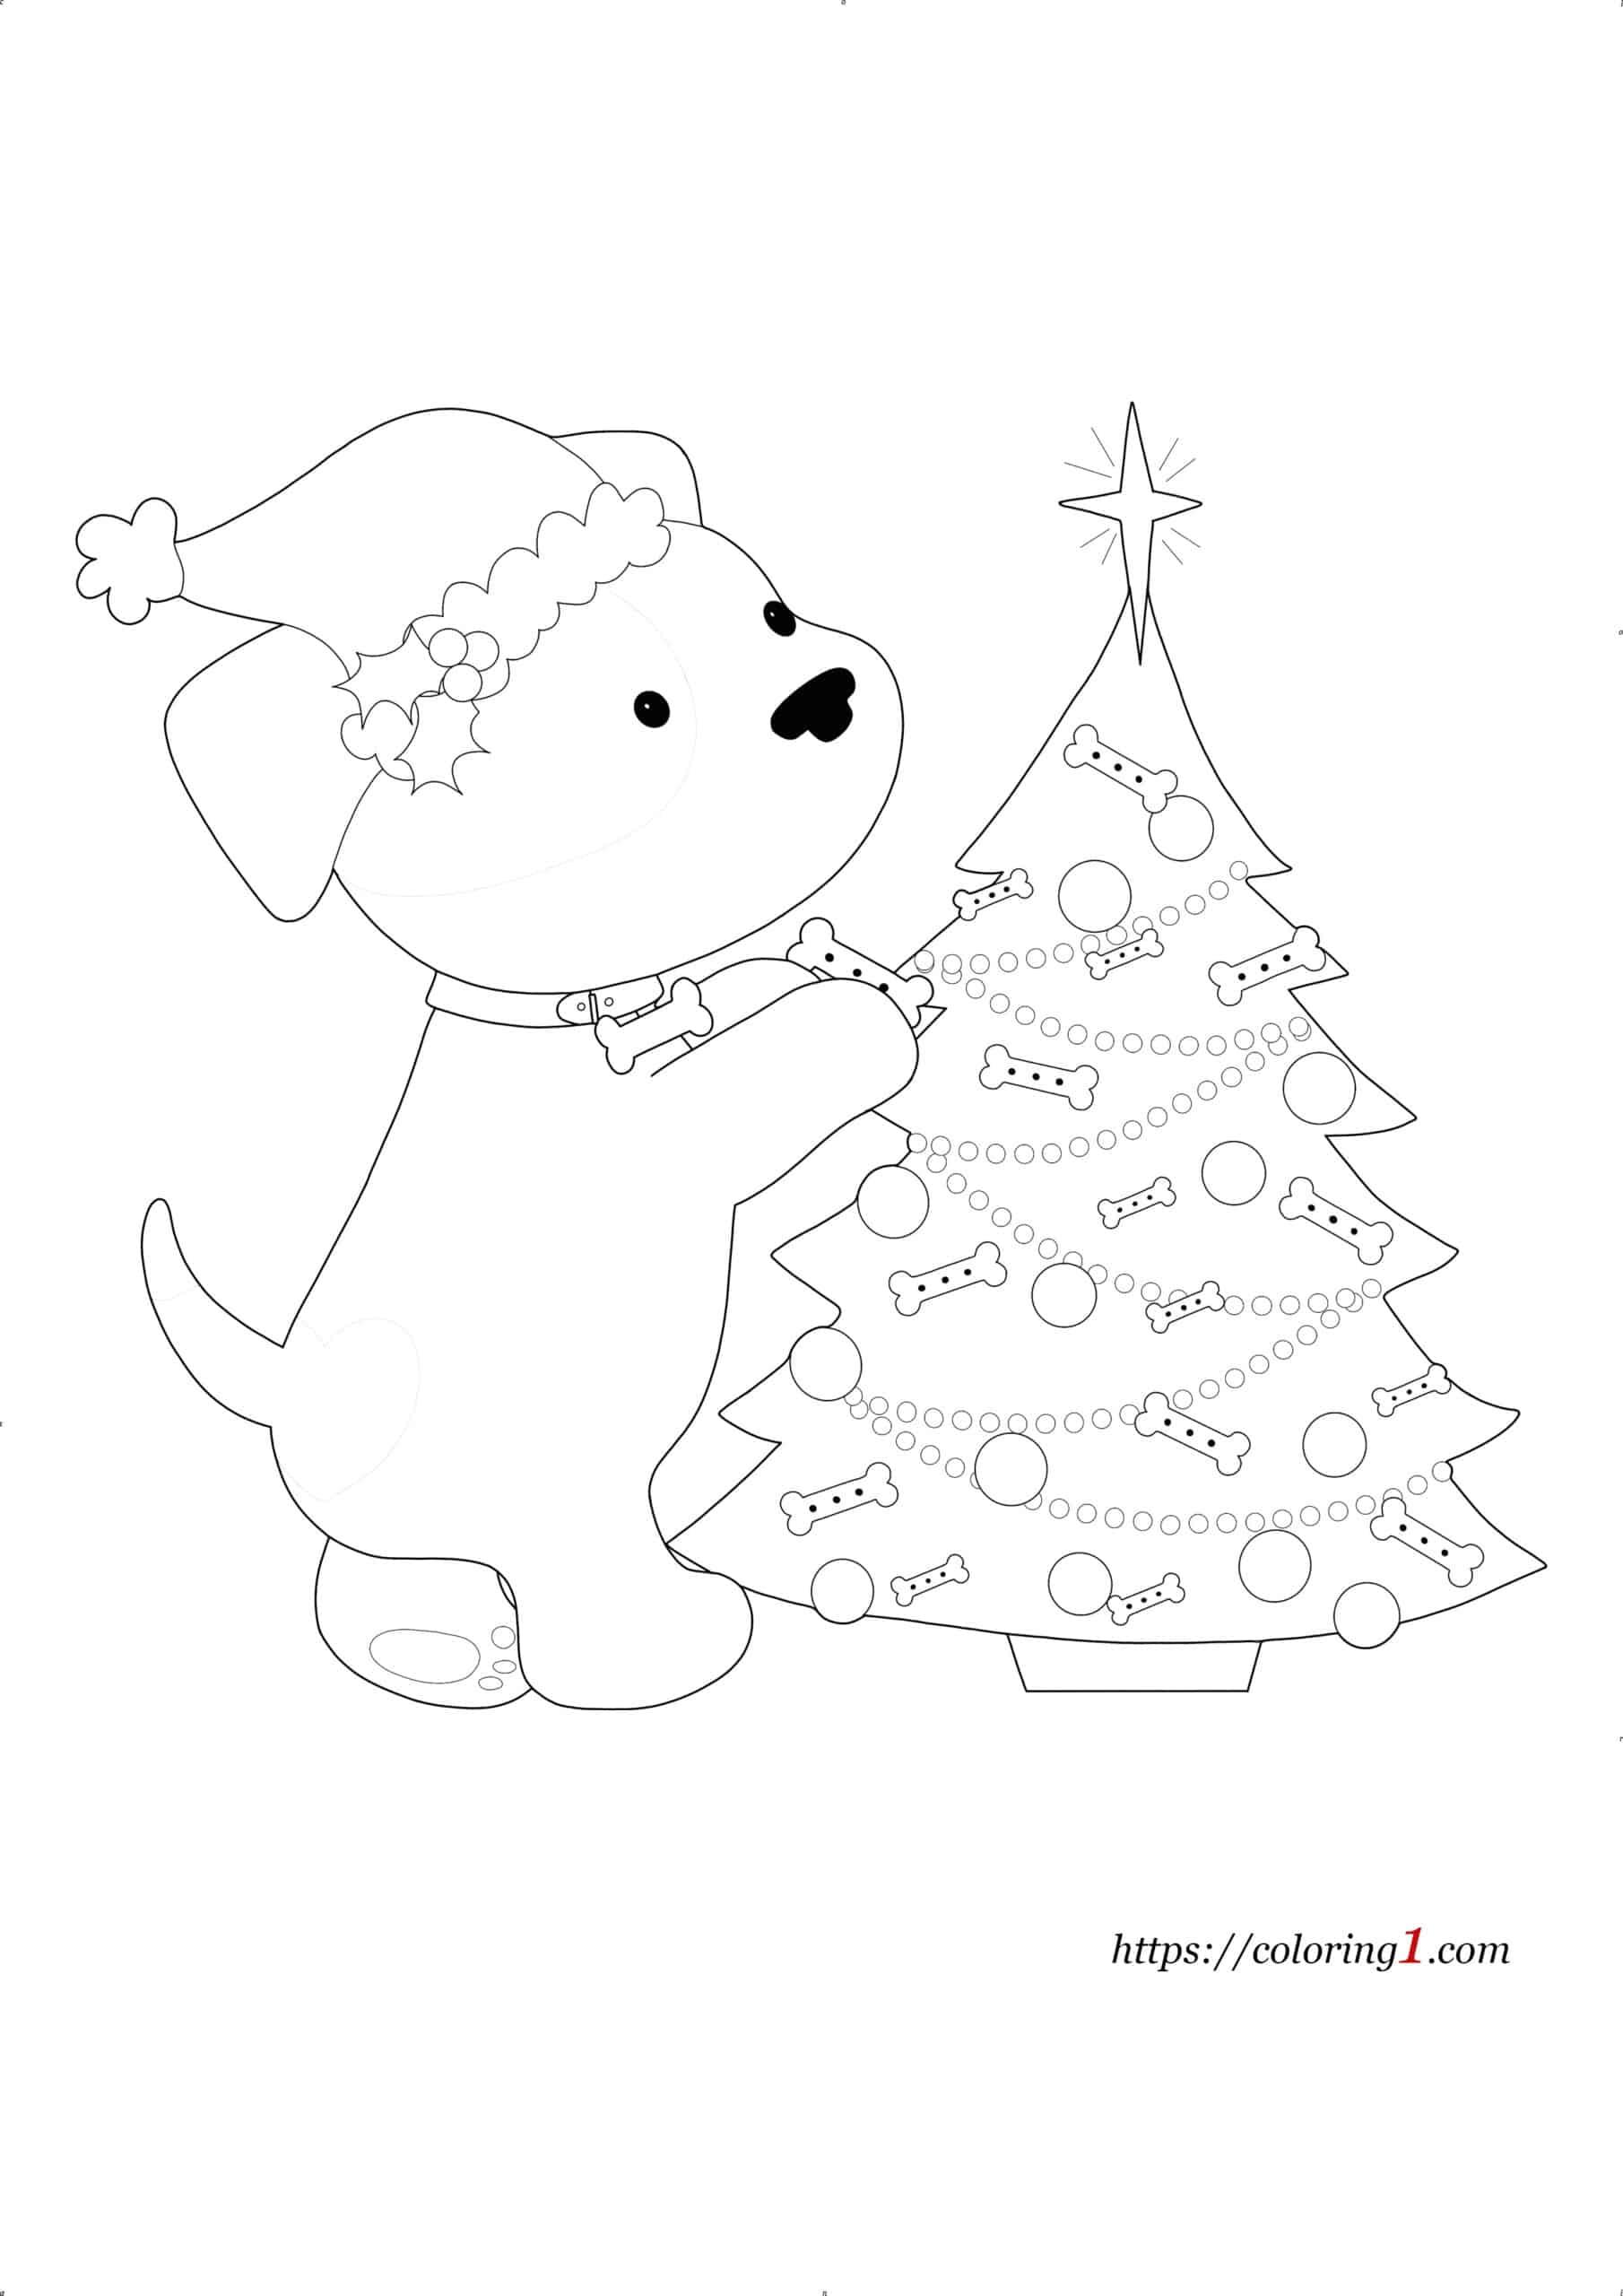 Christmas Dog coloring page for kids